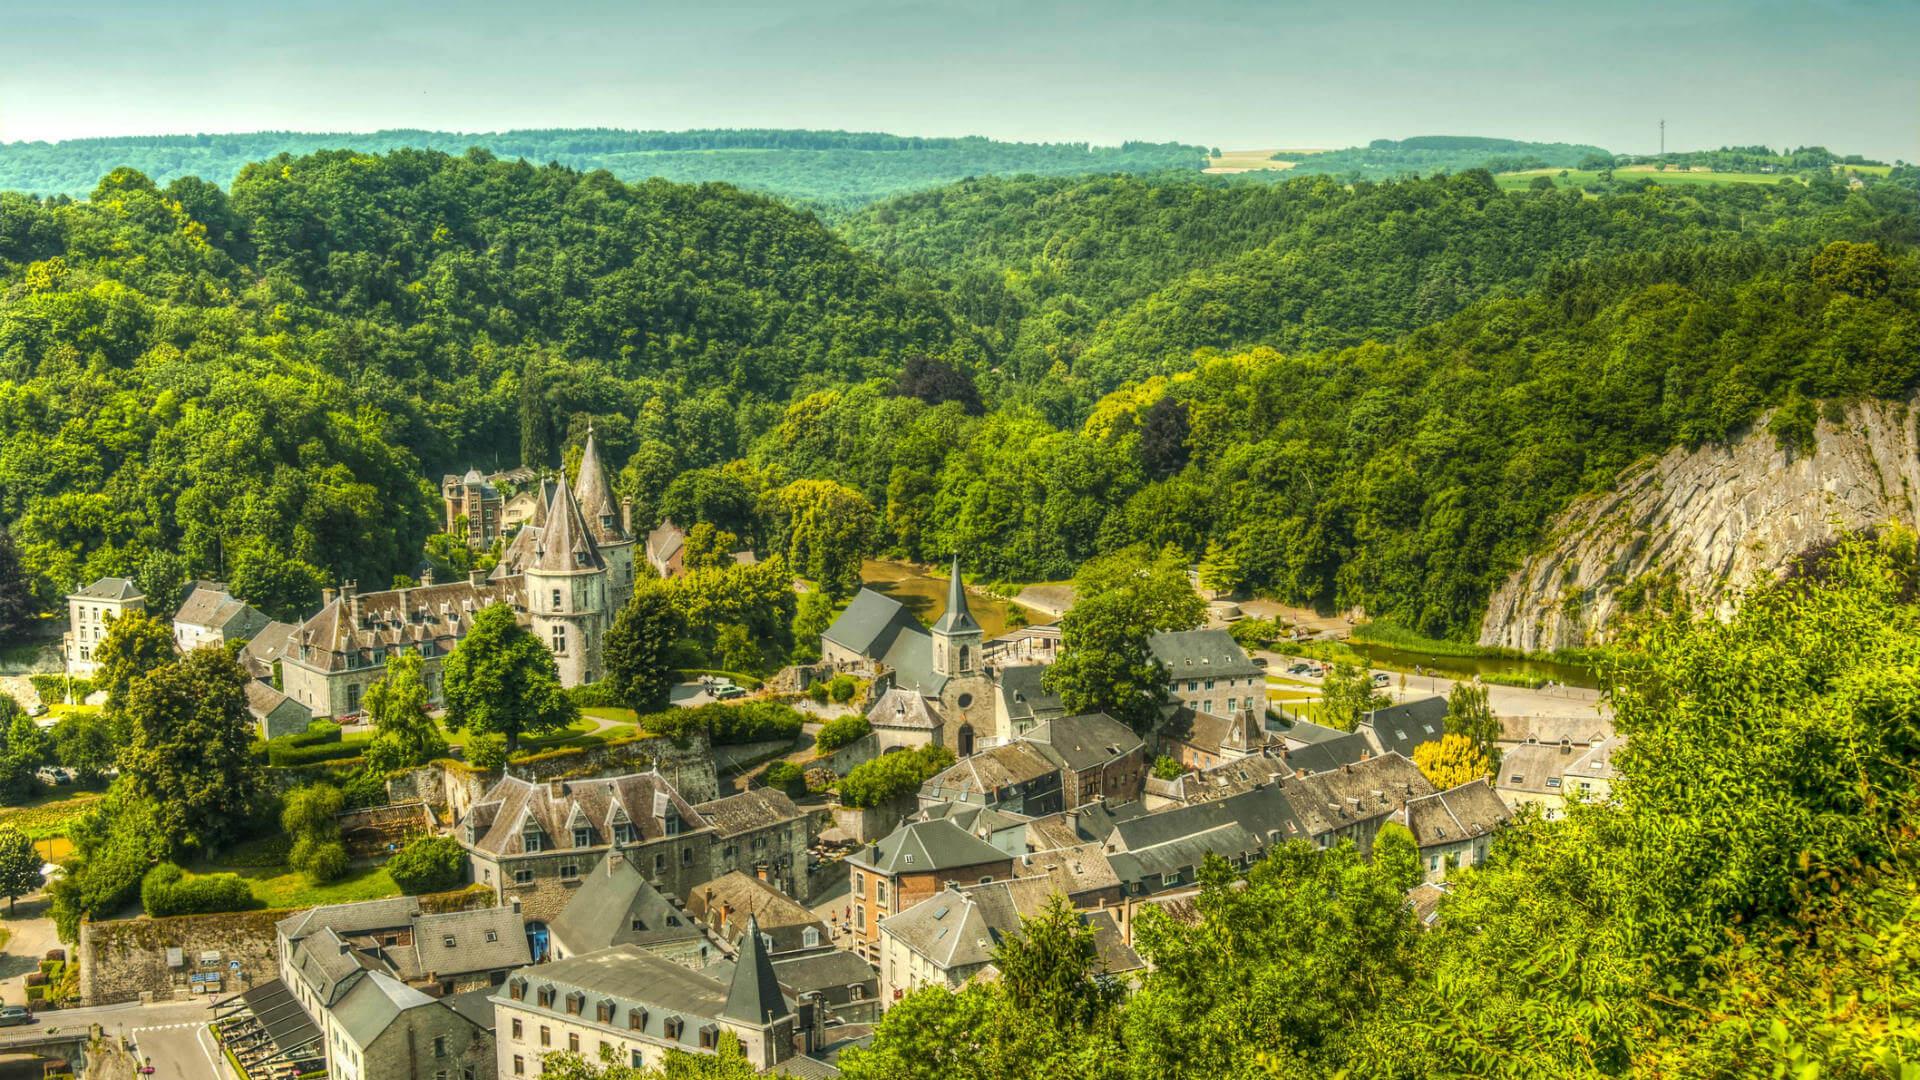 turismo rural en europa durbuy